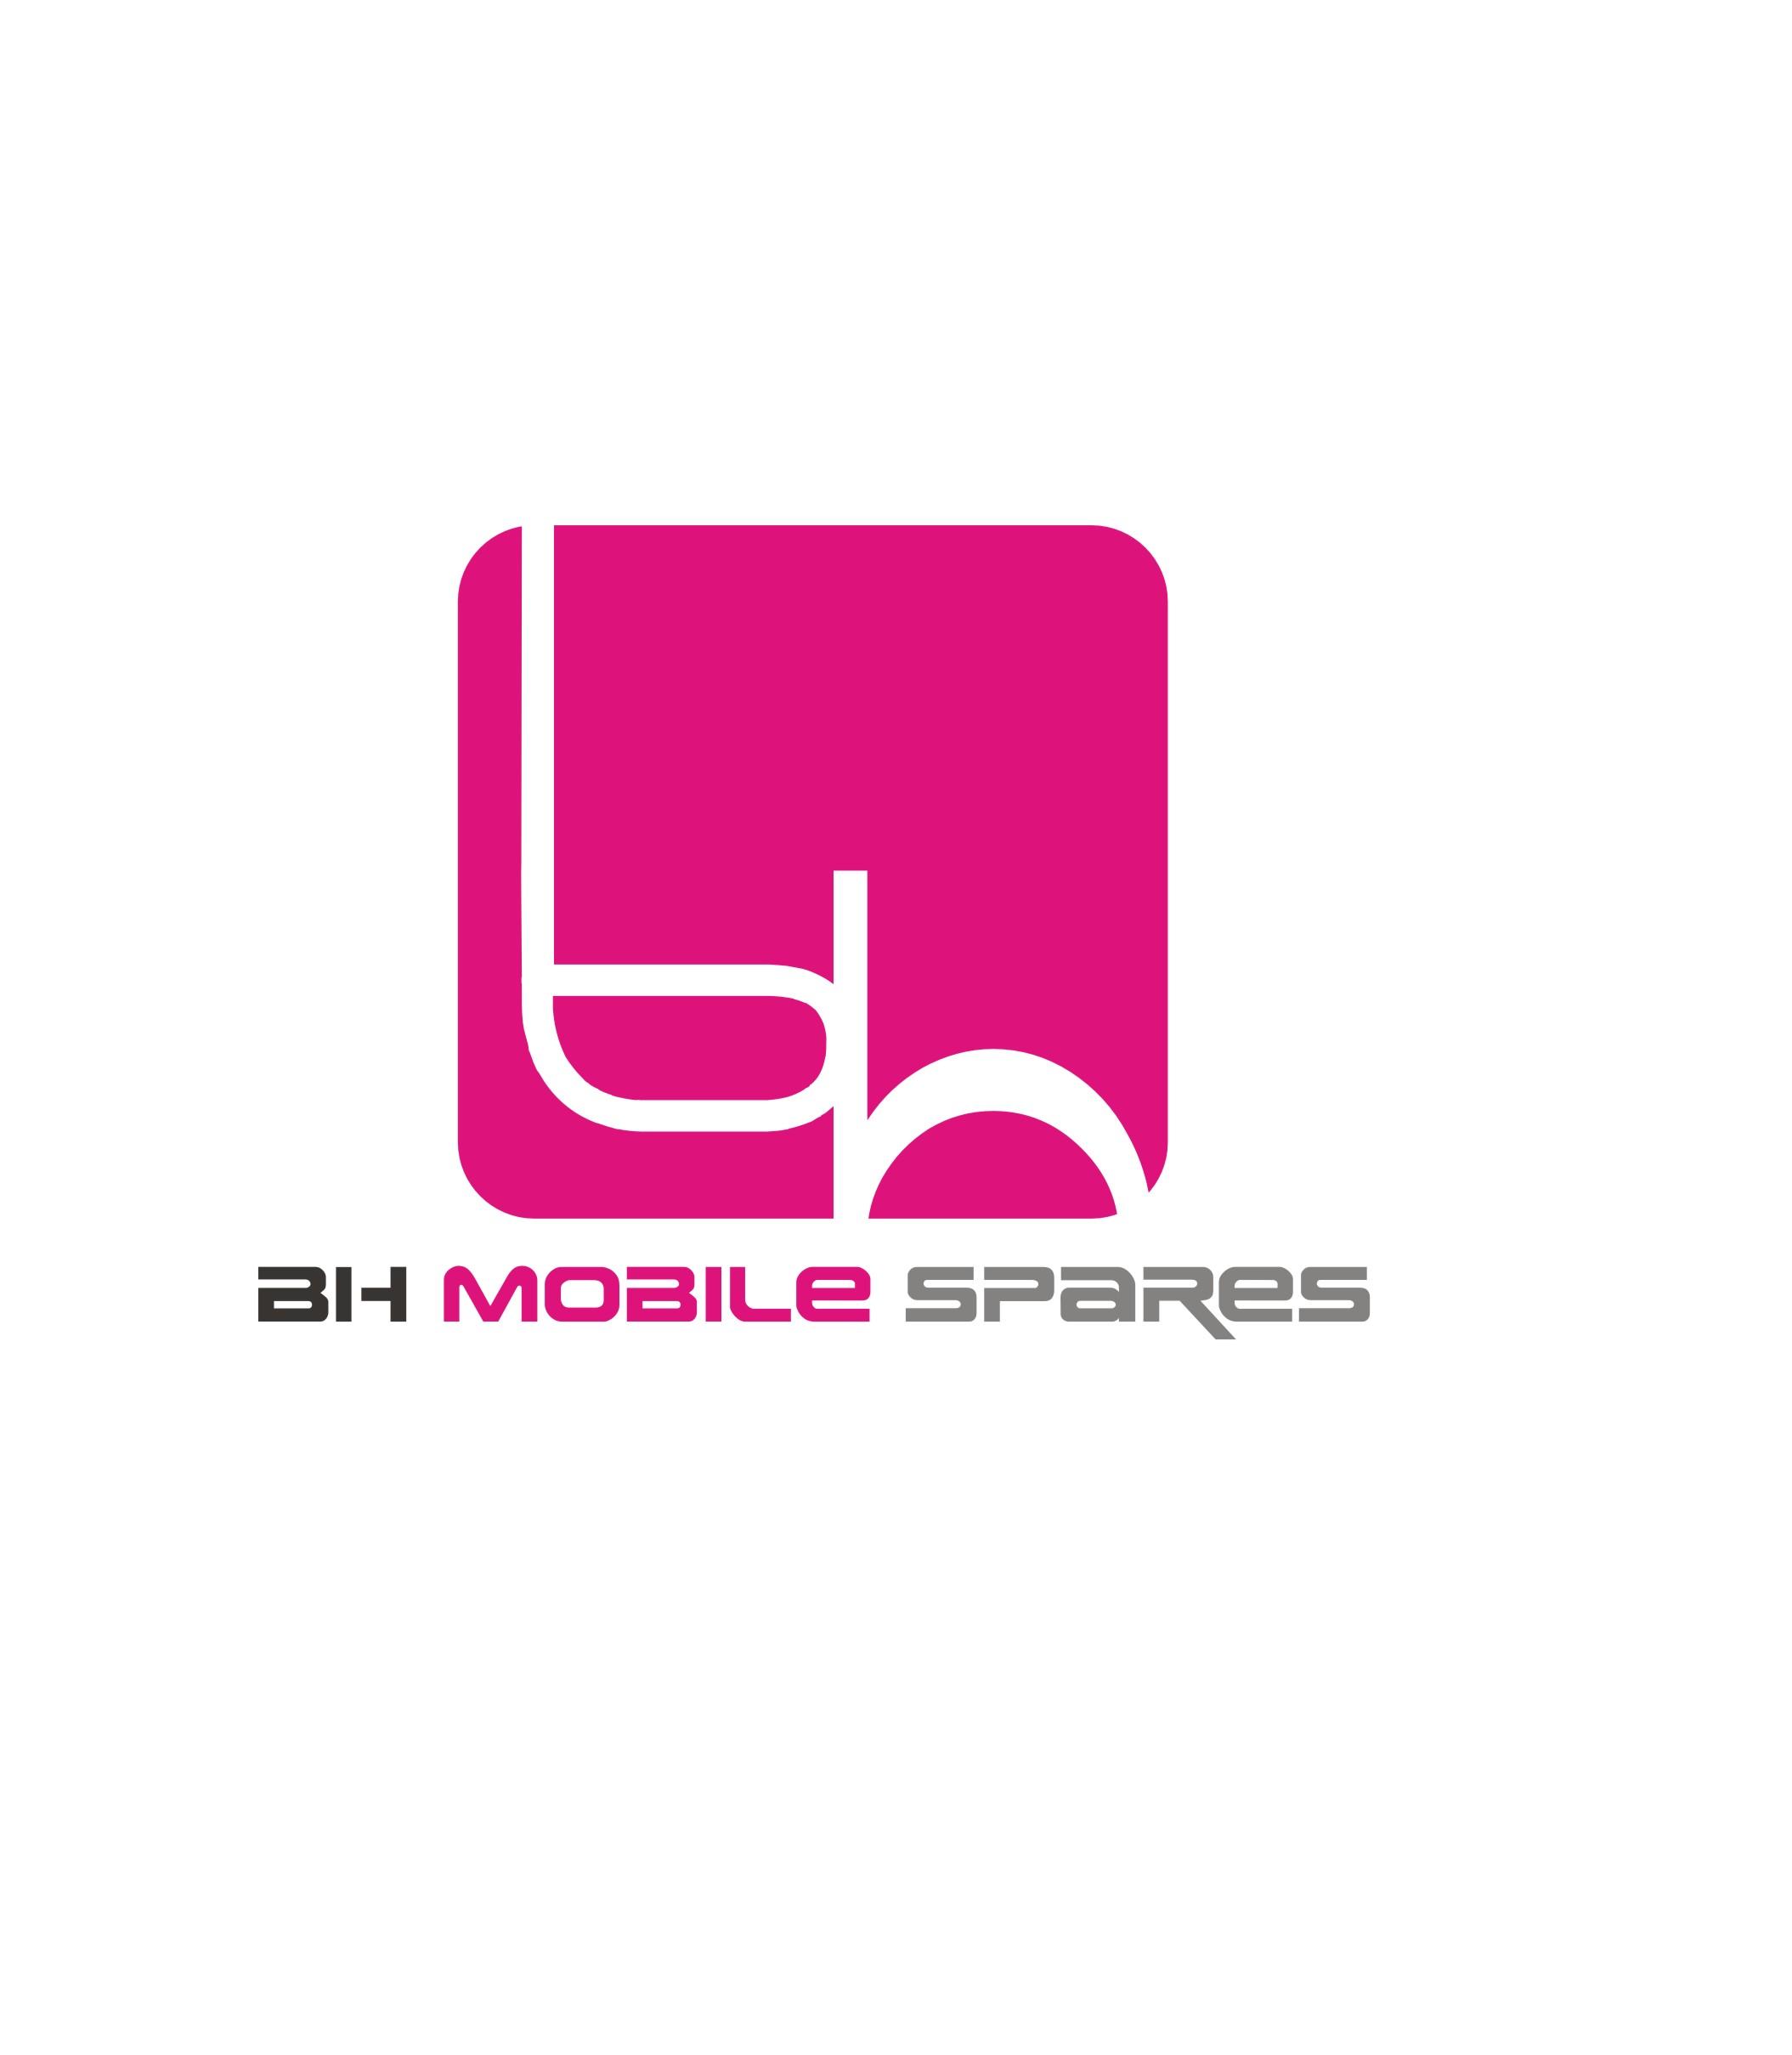 Bh Design modern colorful logo design for bh mobile spares by arpan sarkar